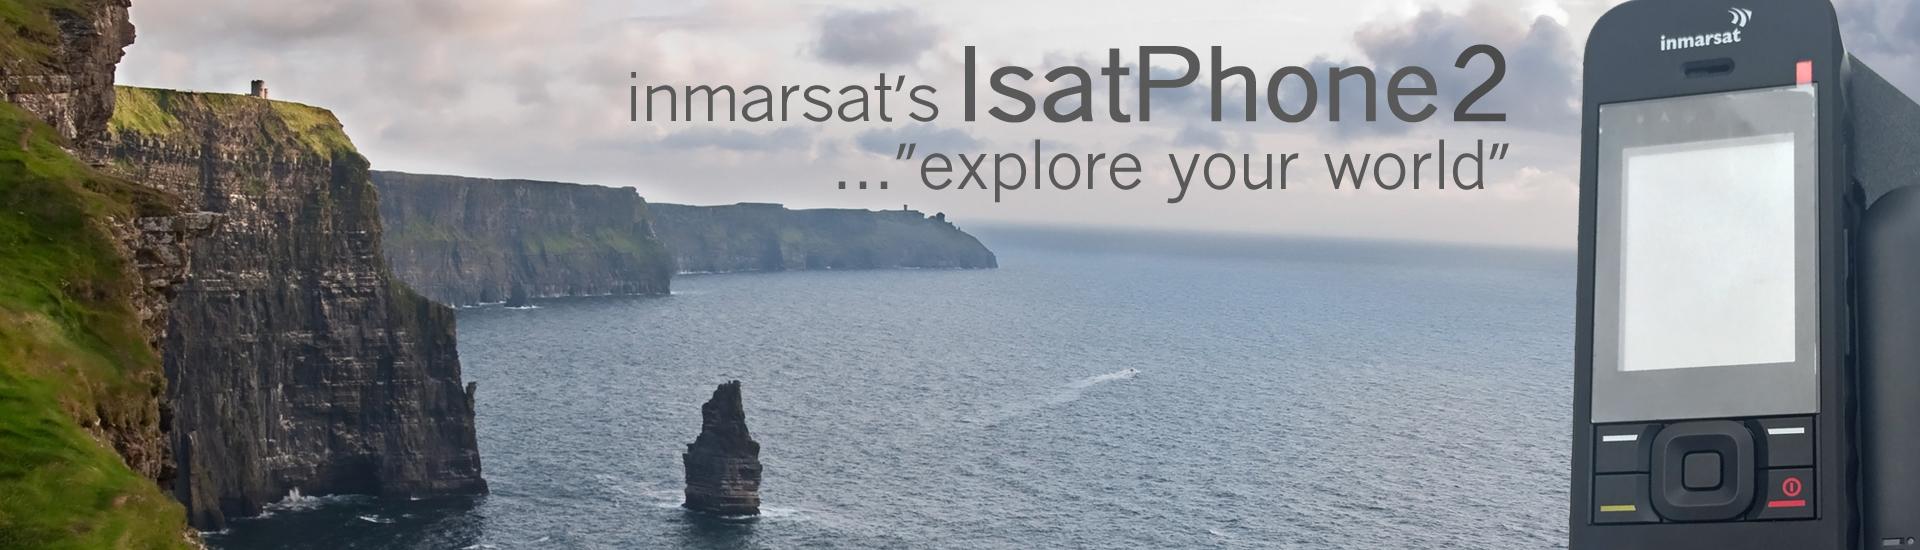 inmarsat-isatphone-2-satellite-phone-northernaxcess-1.jpg